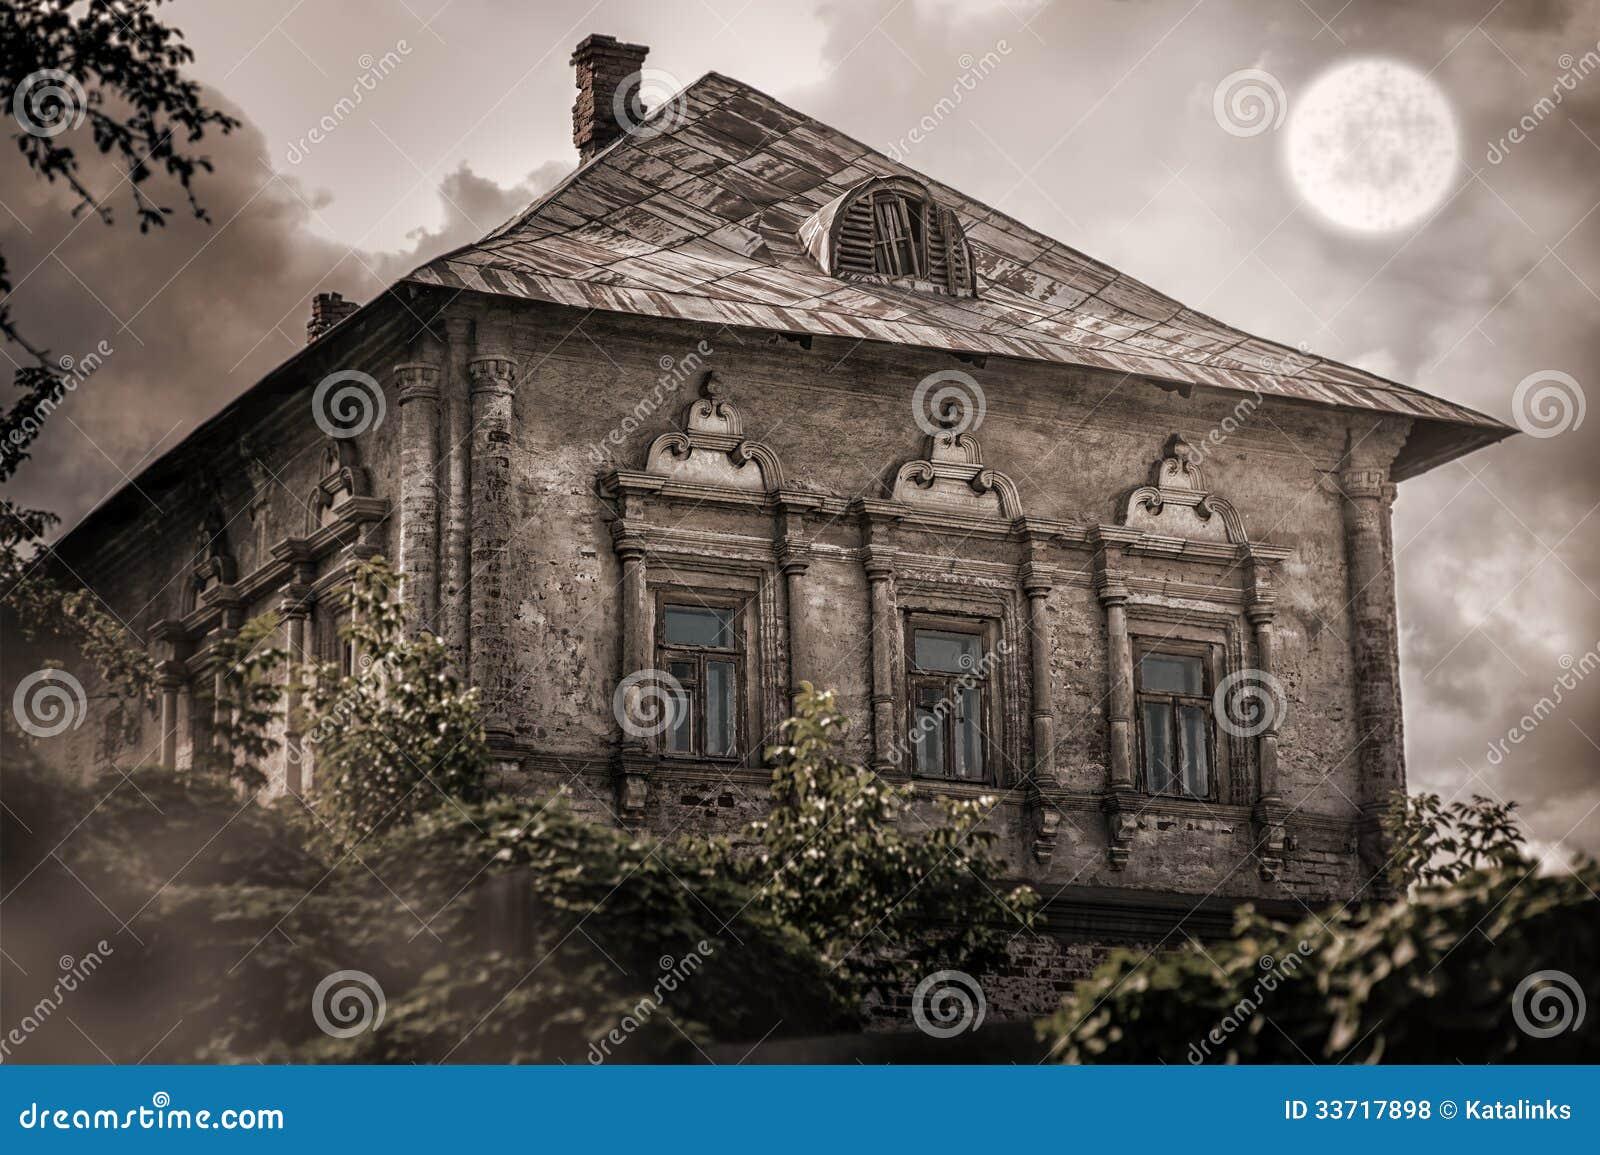 Oud verlaten leeg huis in bos stock foto afbeelding 33717898 - Foto huis in l ...